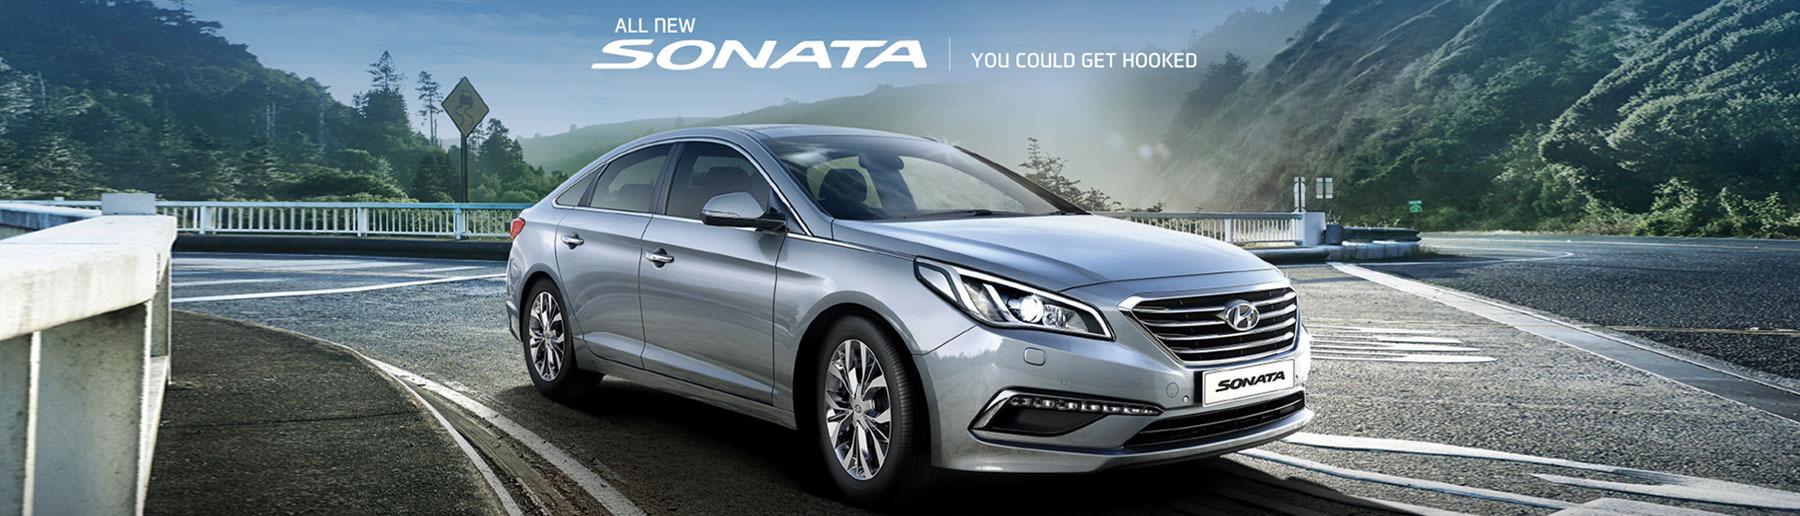 All New Hyundai Sonata